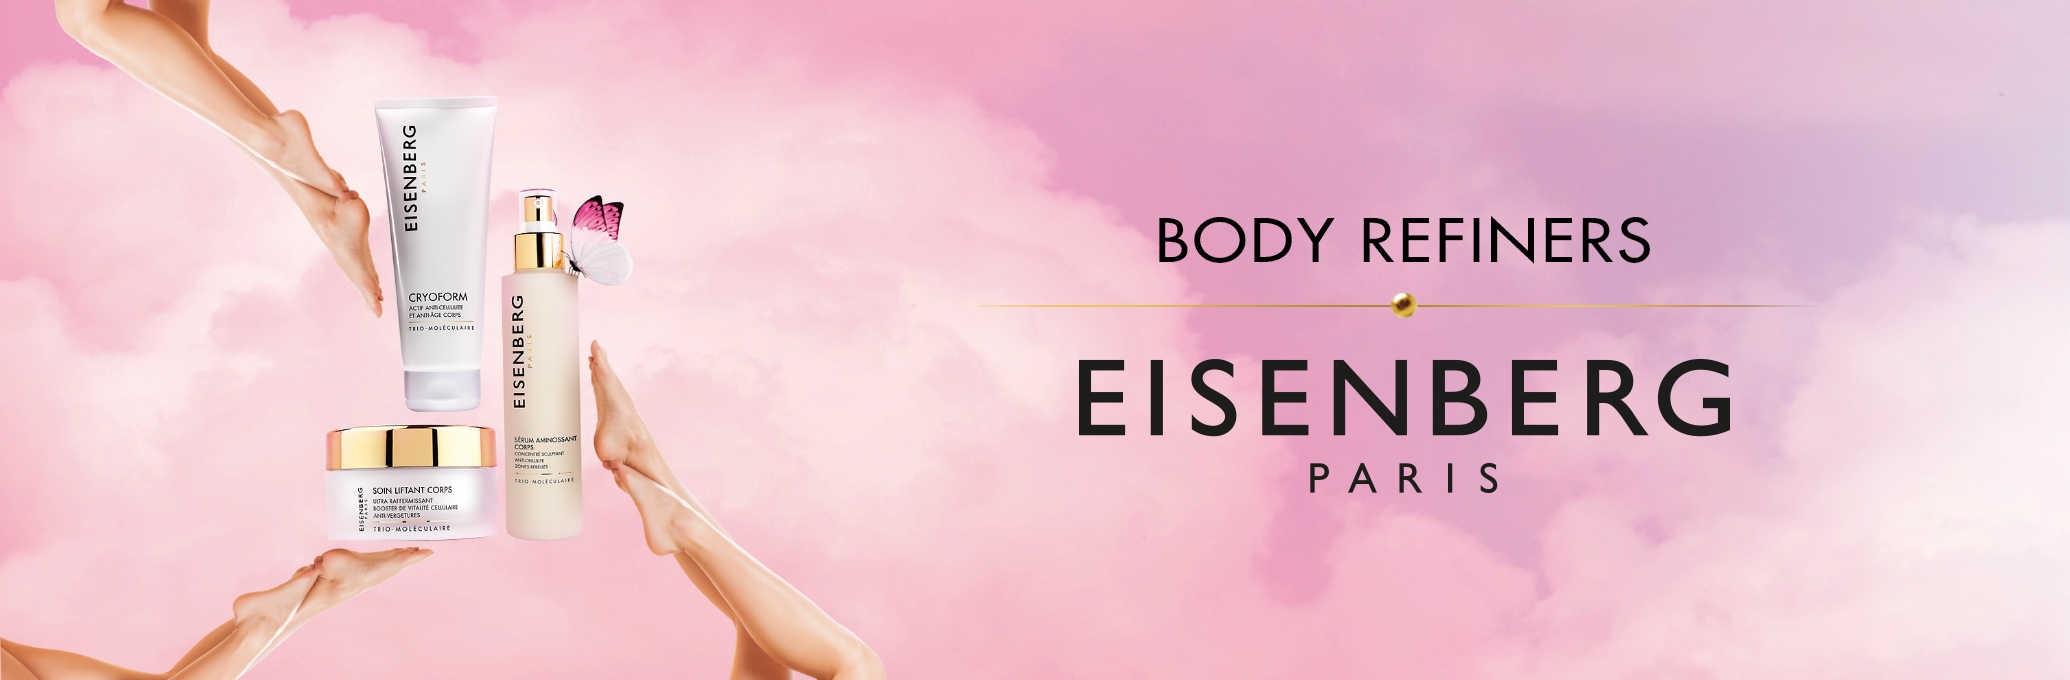 Eisenberg Body Refiners